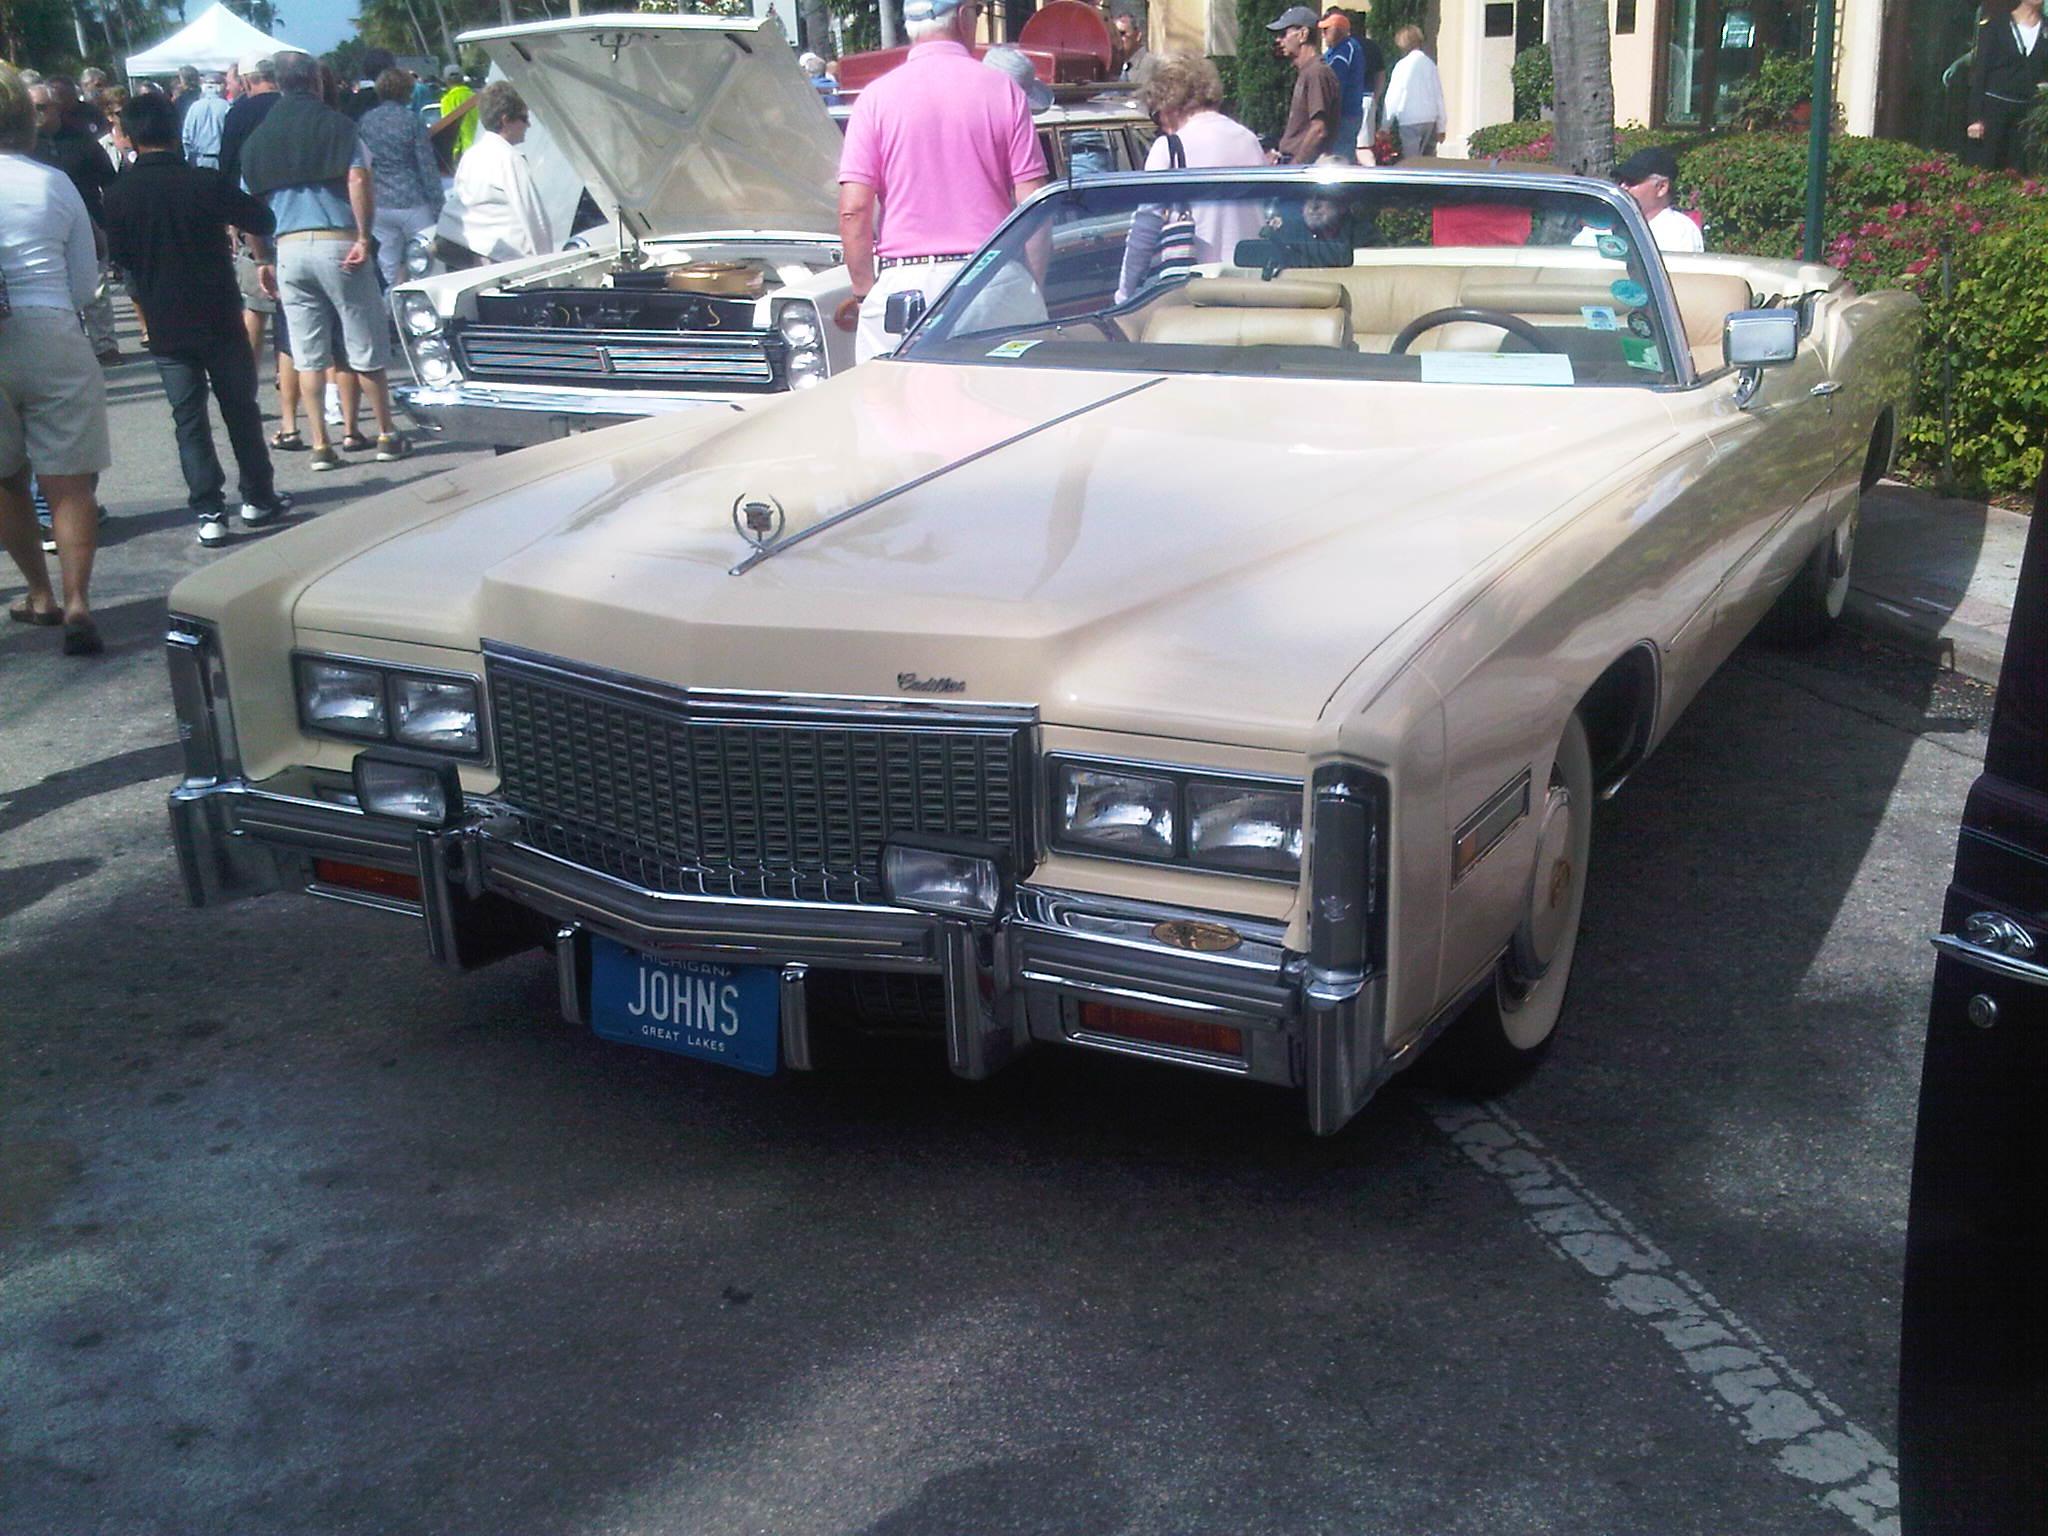 1970 Impala For Sale Craigslist - 2019-2020 New Upcoming